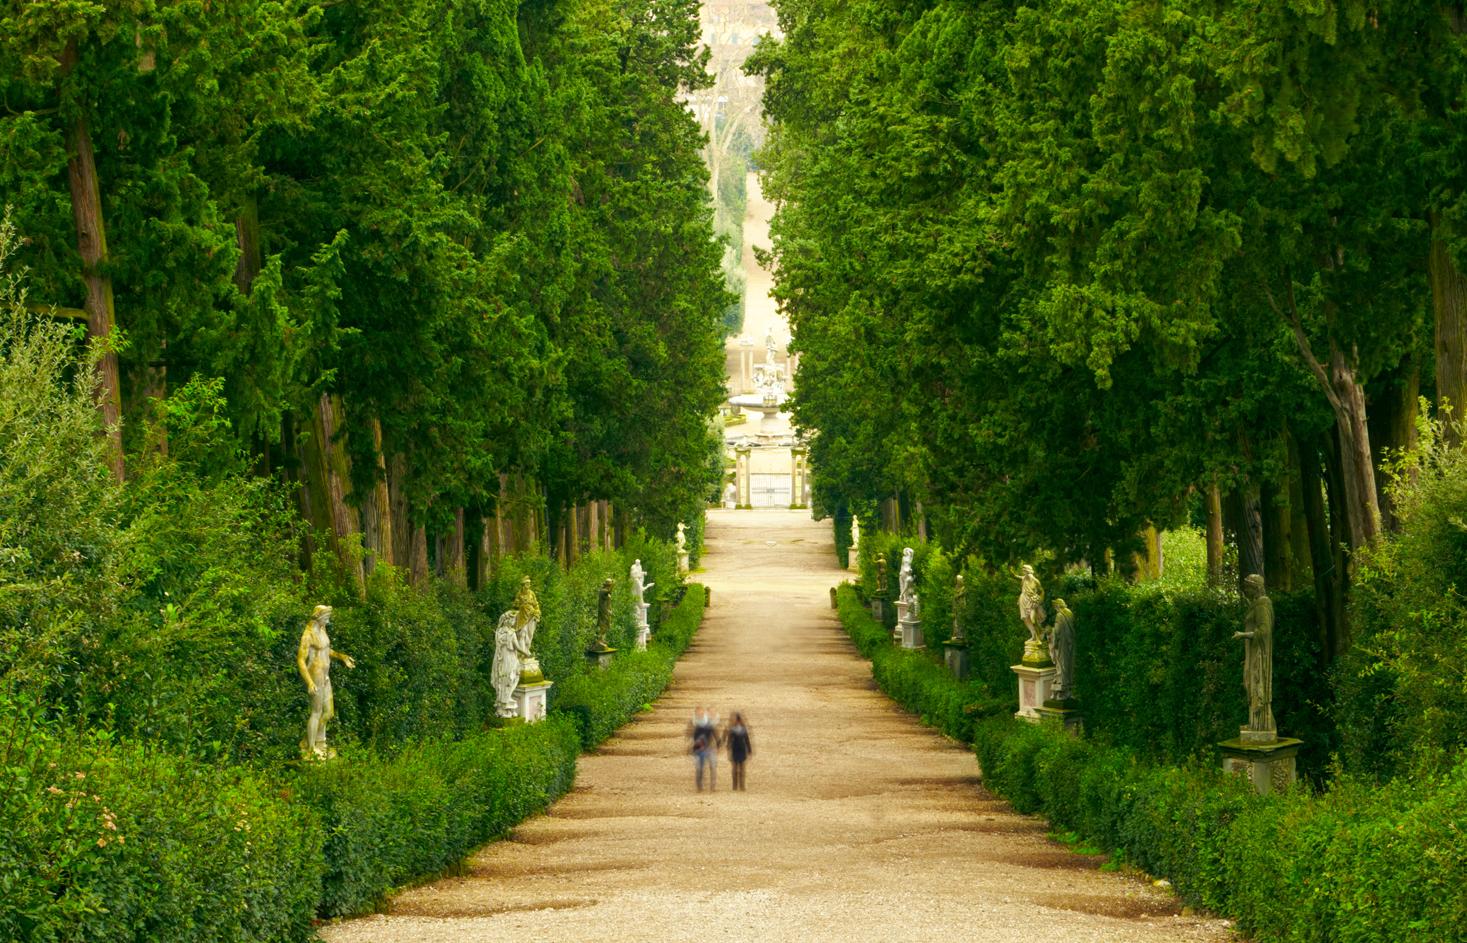 Il giardino di boboli a firenze - Giardino di boboli firenze ...